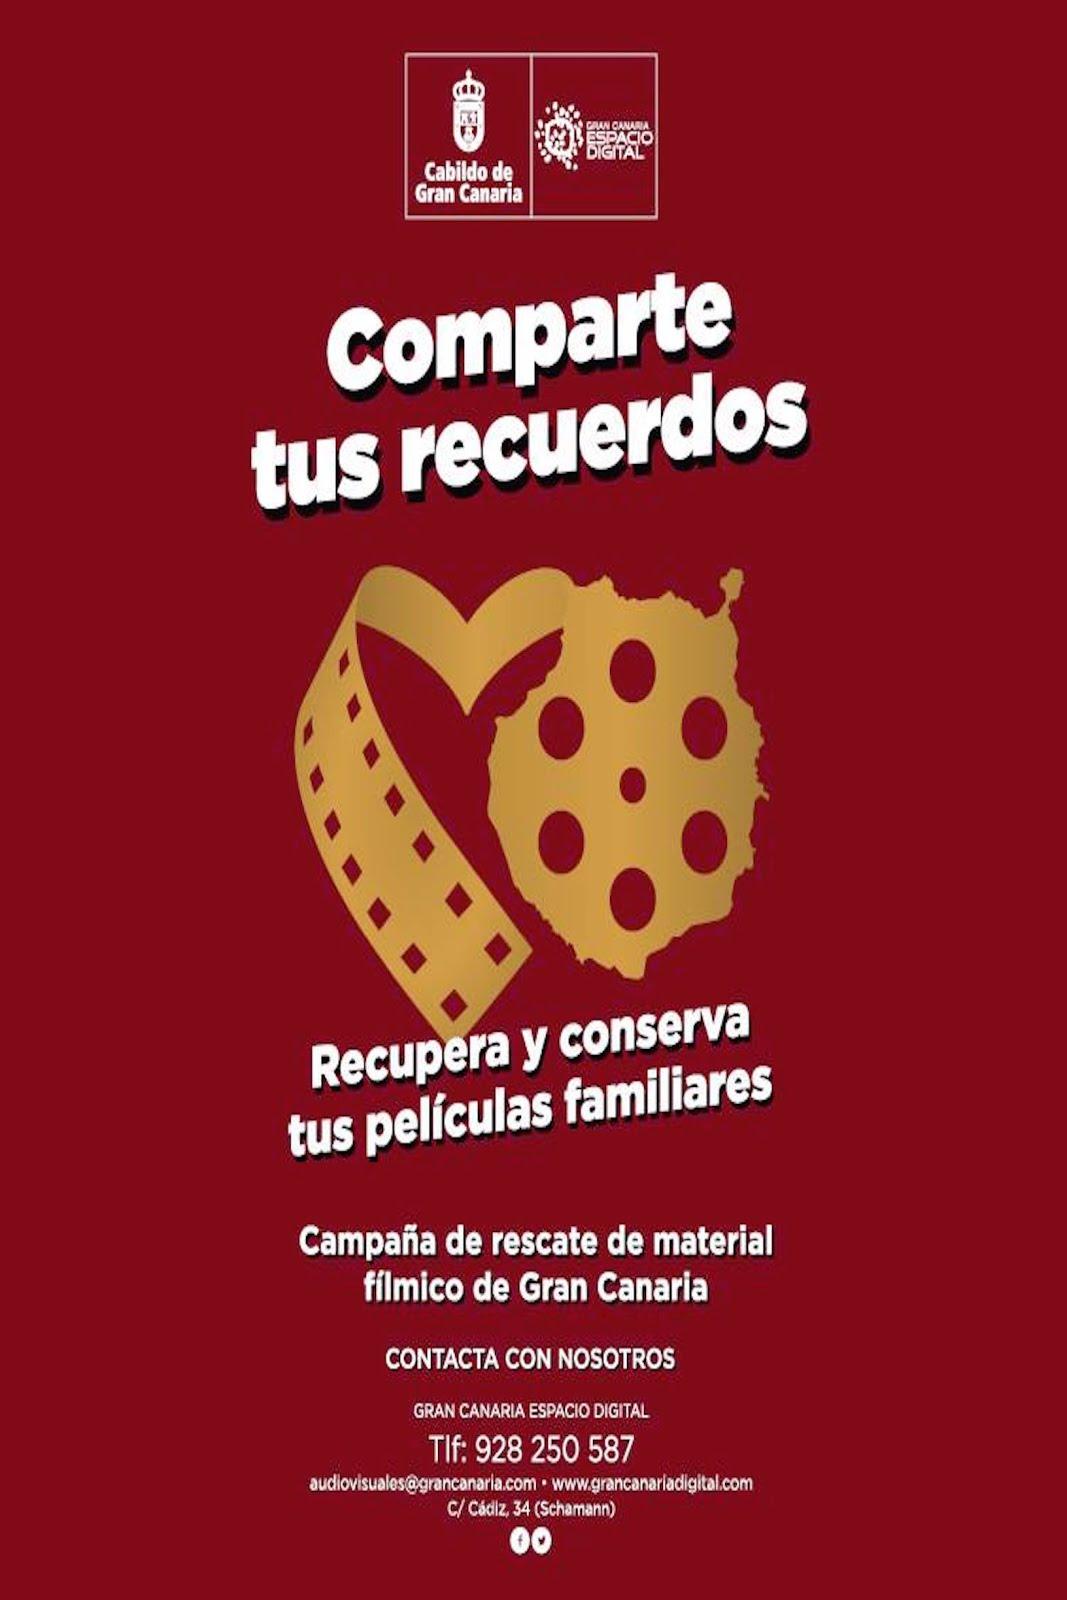 Campaña de Recuparación de Material Fílmico de Gran Canaria